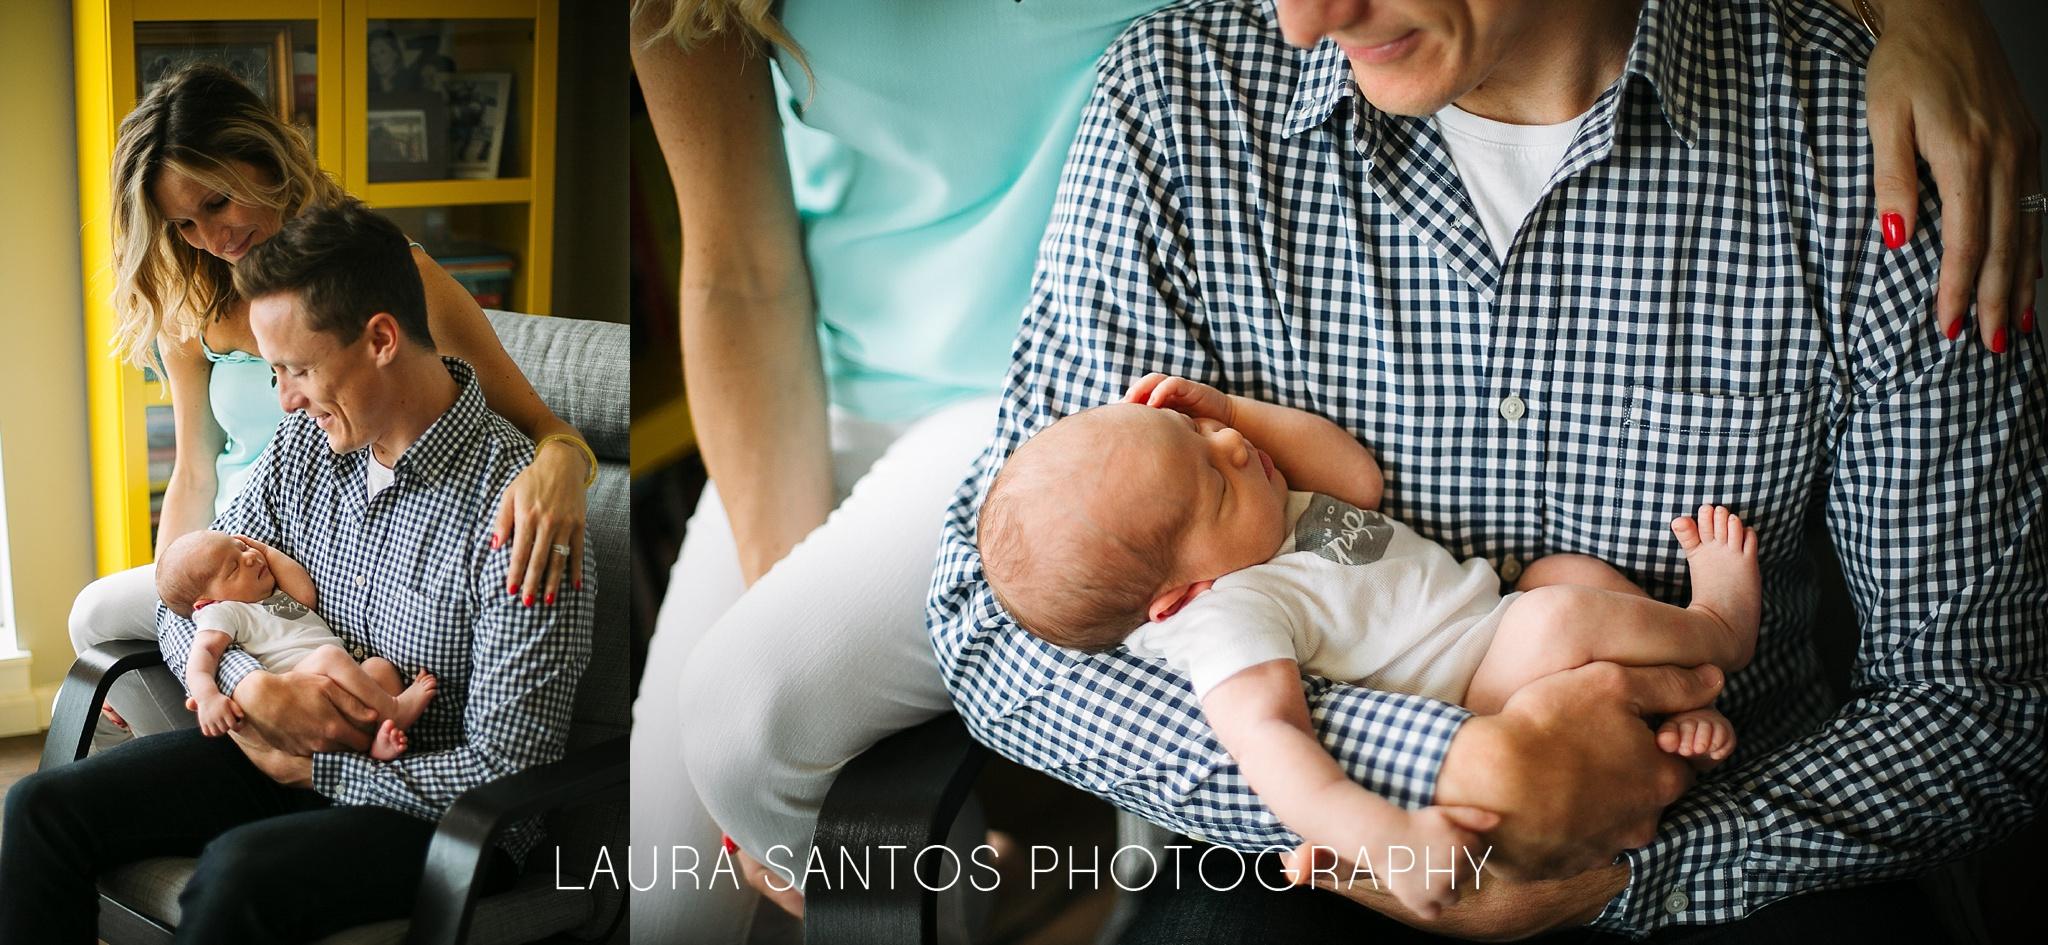 Laura Santos Photography Portland Oregon Family Photographer_0296.jpg